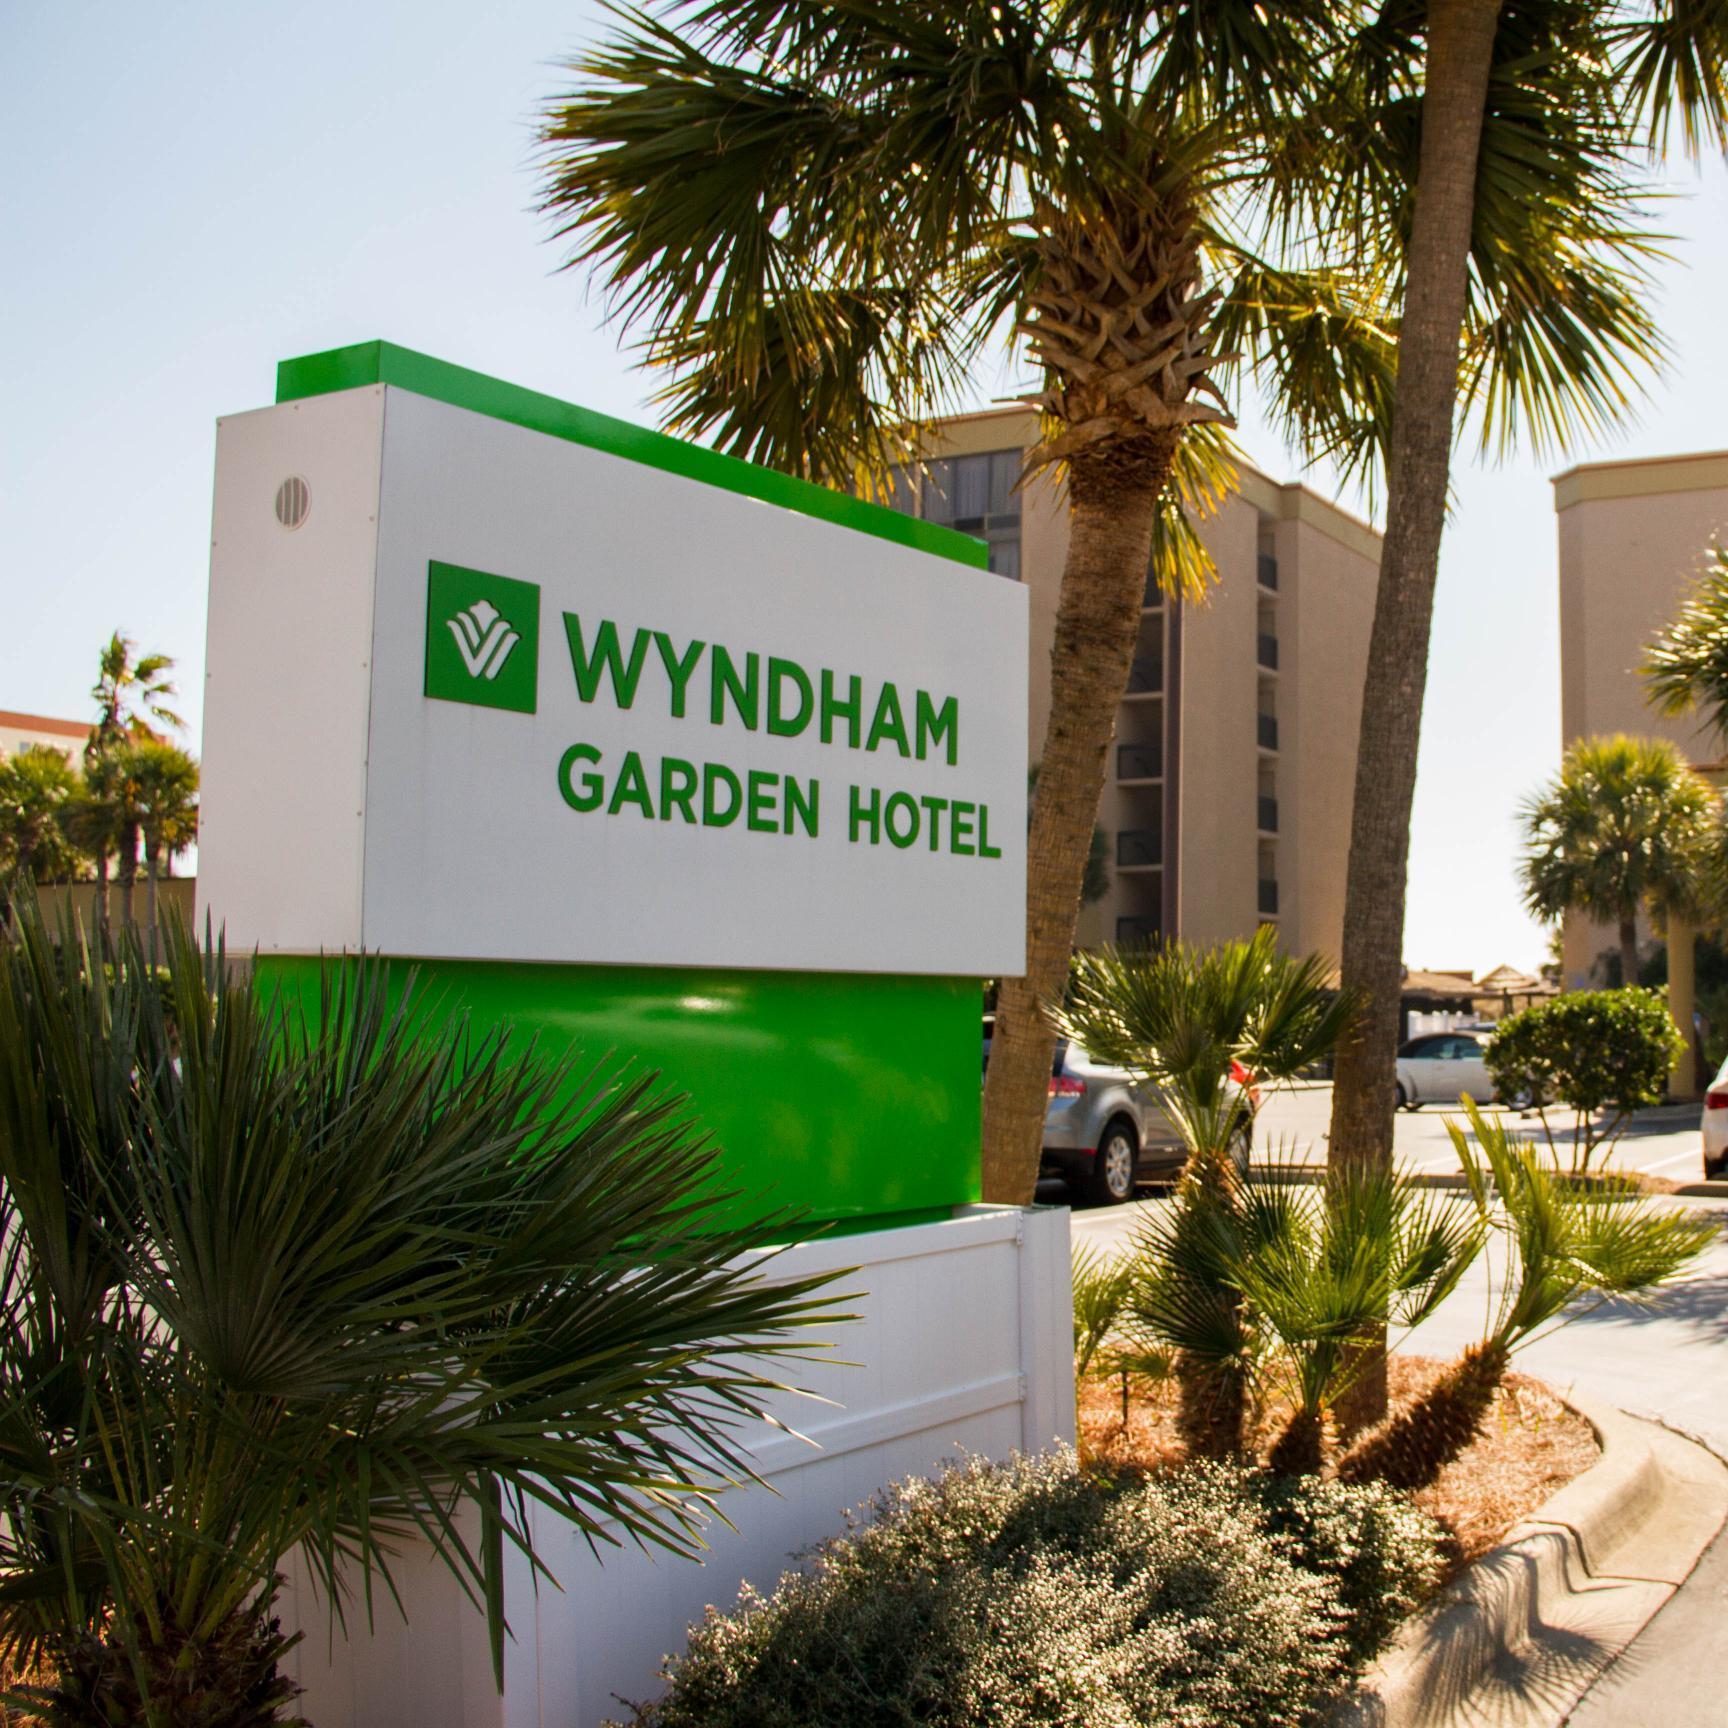 wyndham garden fwb - Wyndham Garden Fort Walton Beach